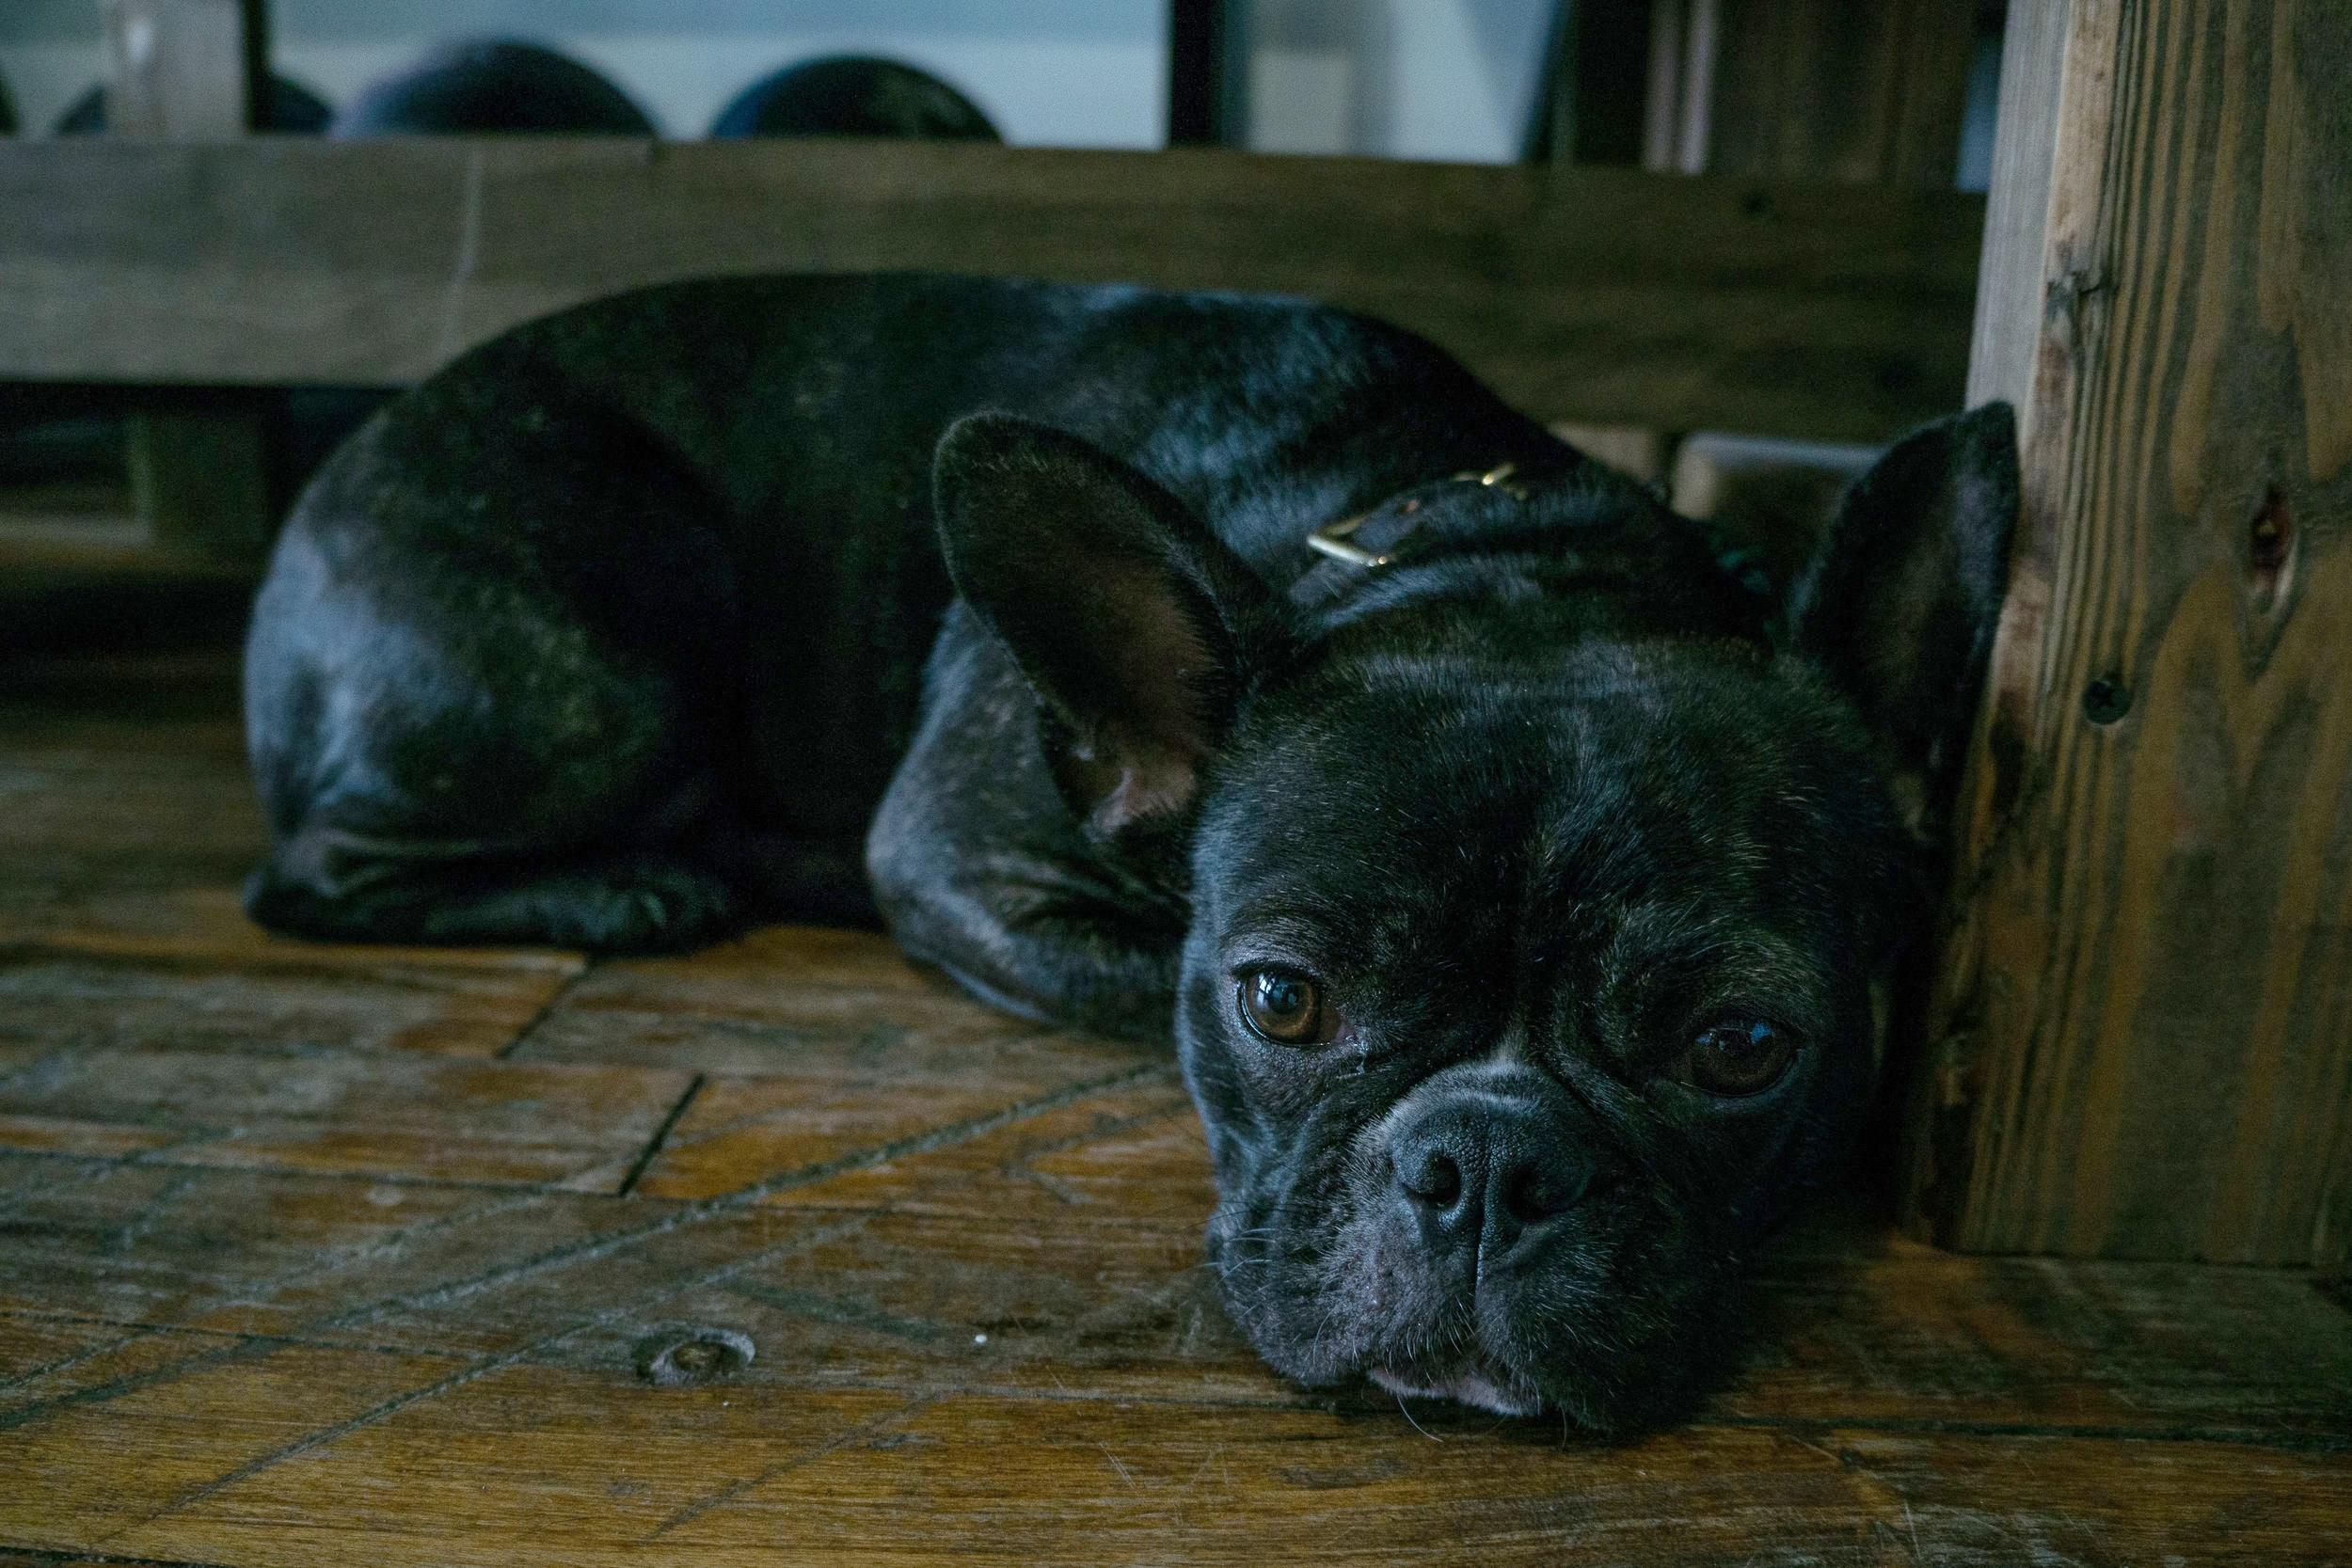 vickygood_photography_dog_series.jpg